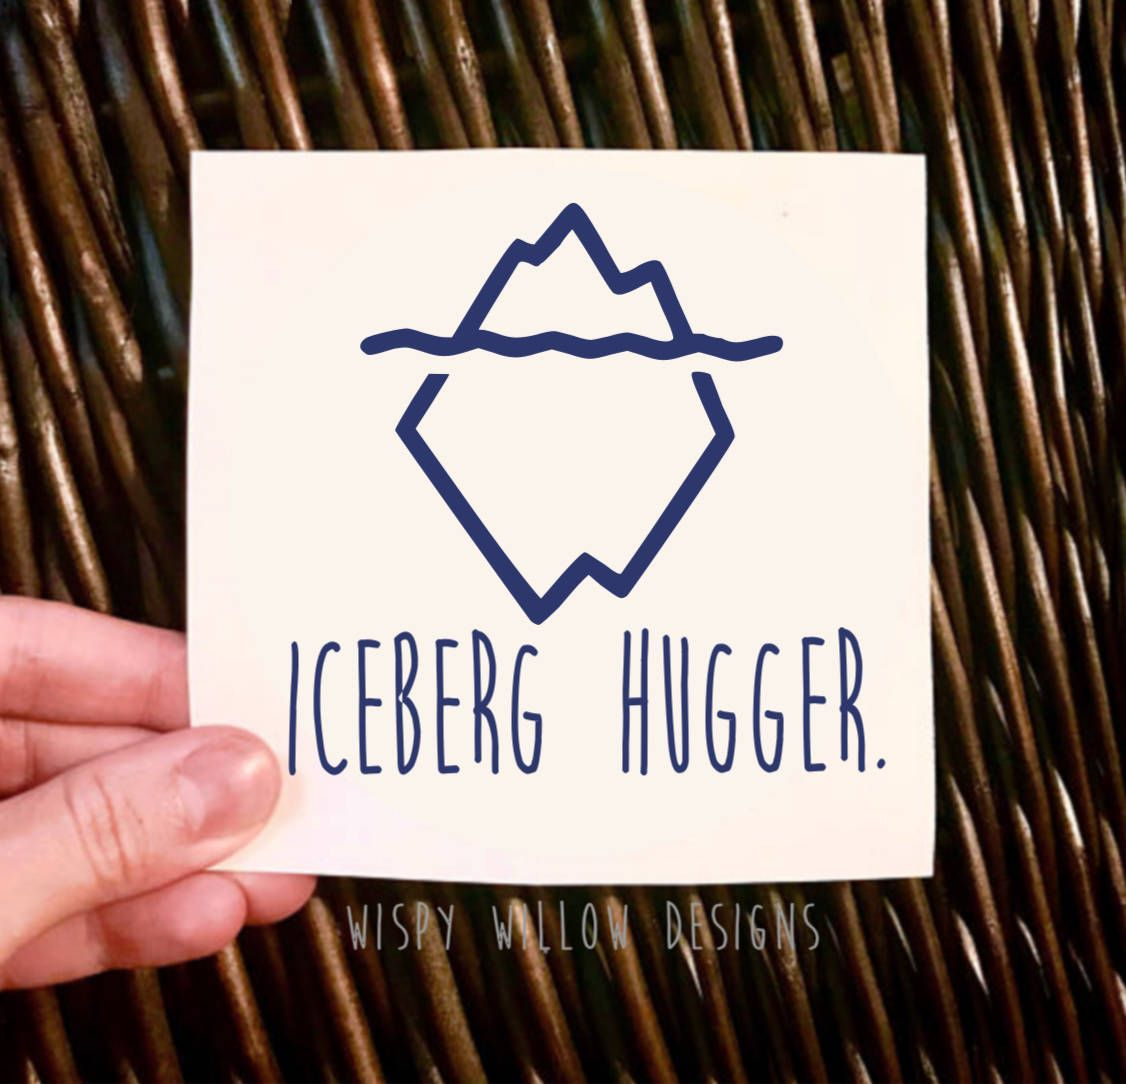 Iceberg Hugger Vinyl Decal Global Warming Decal Car Decal Car Sticker Protest Environment Conservancy Nature Treehugge Vinyl Decals Tree Hugger Huggers [ 1084 x 1126 Pixel ]